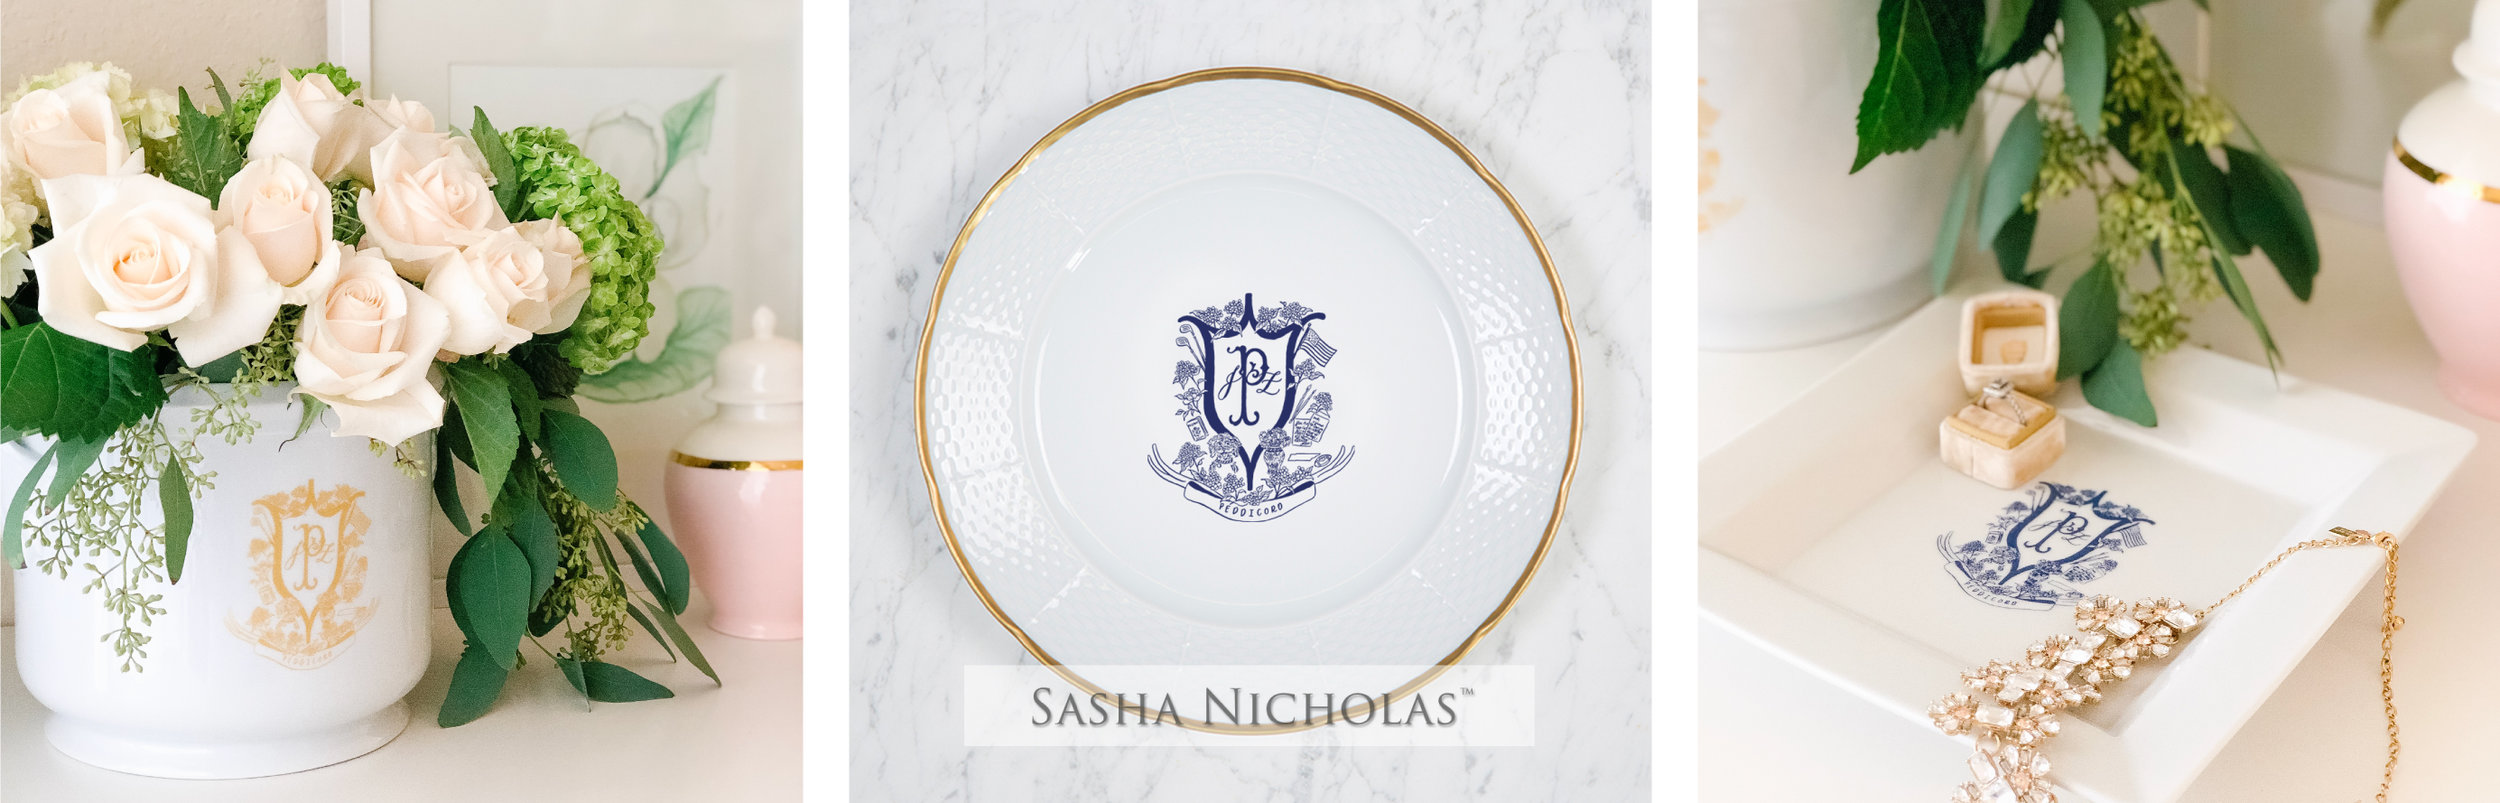 Simply-Jessica-Marie-Crests-for-Sasha-Nicholas.jpg